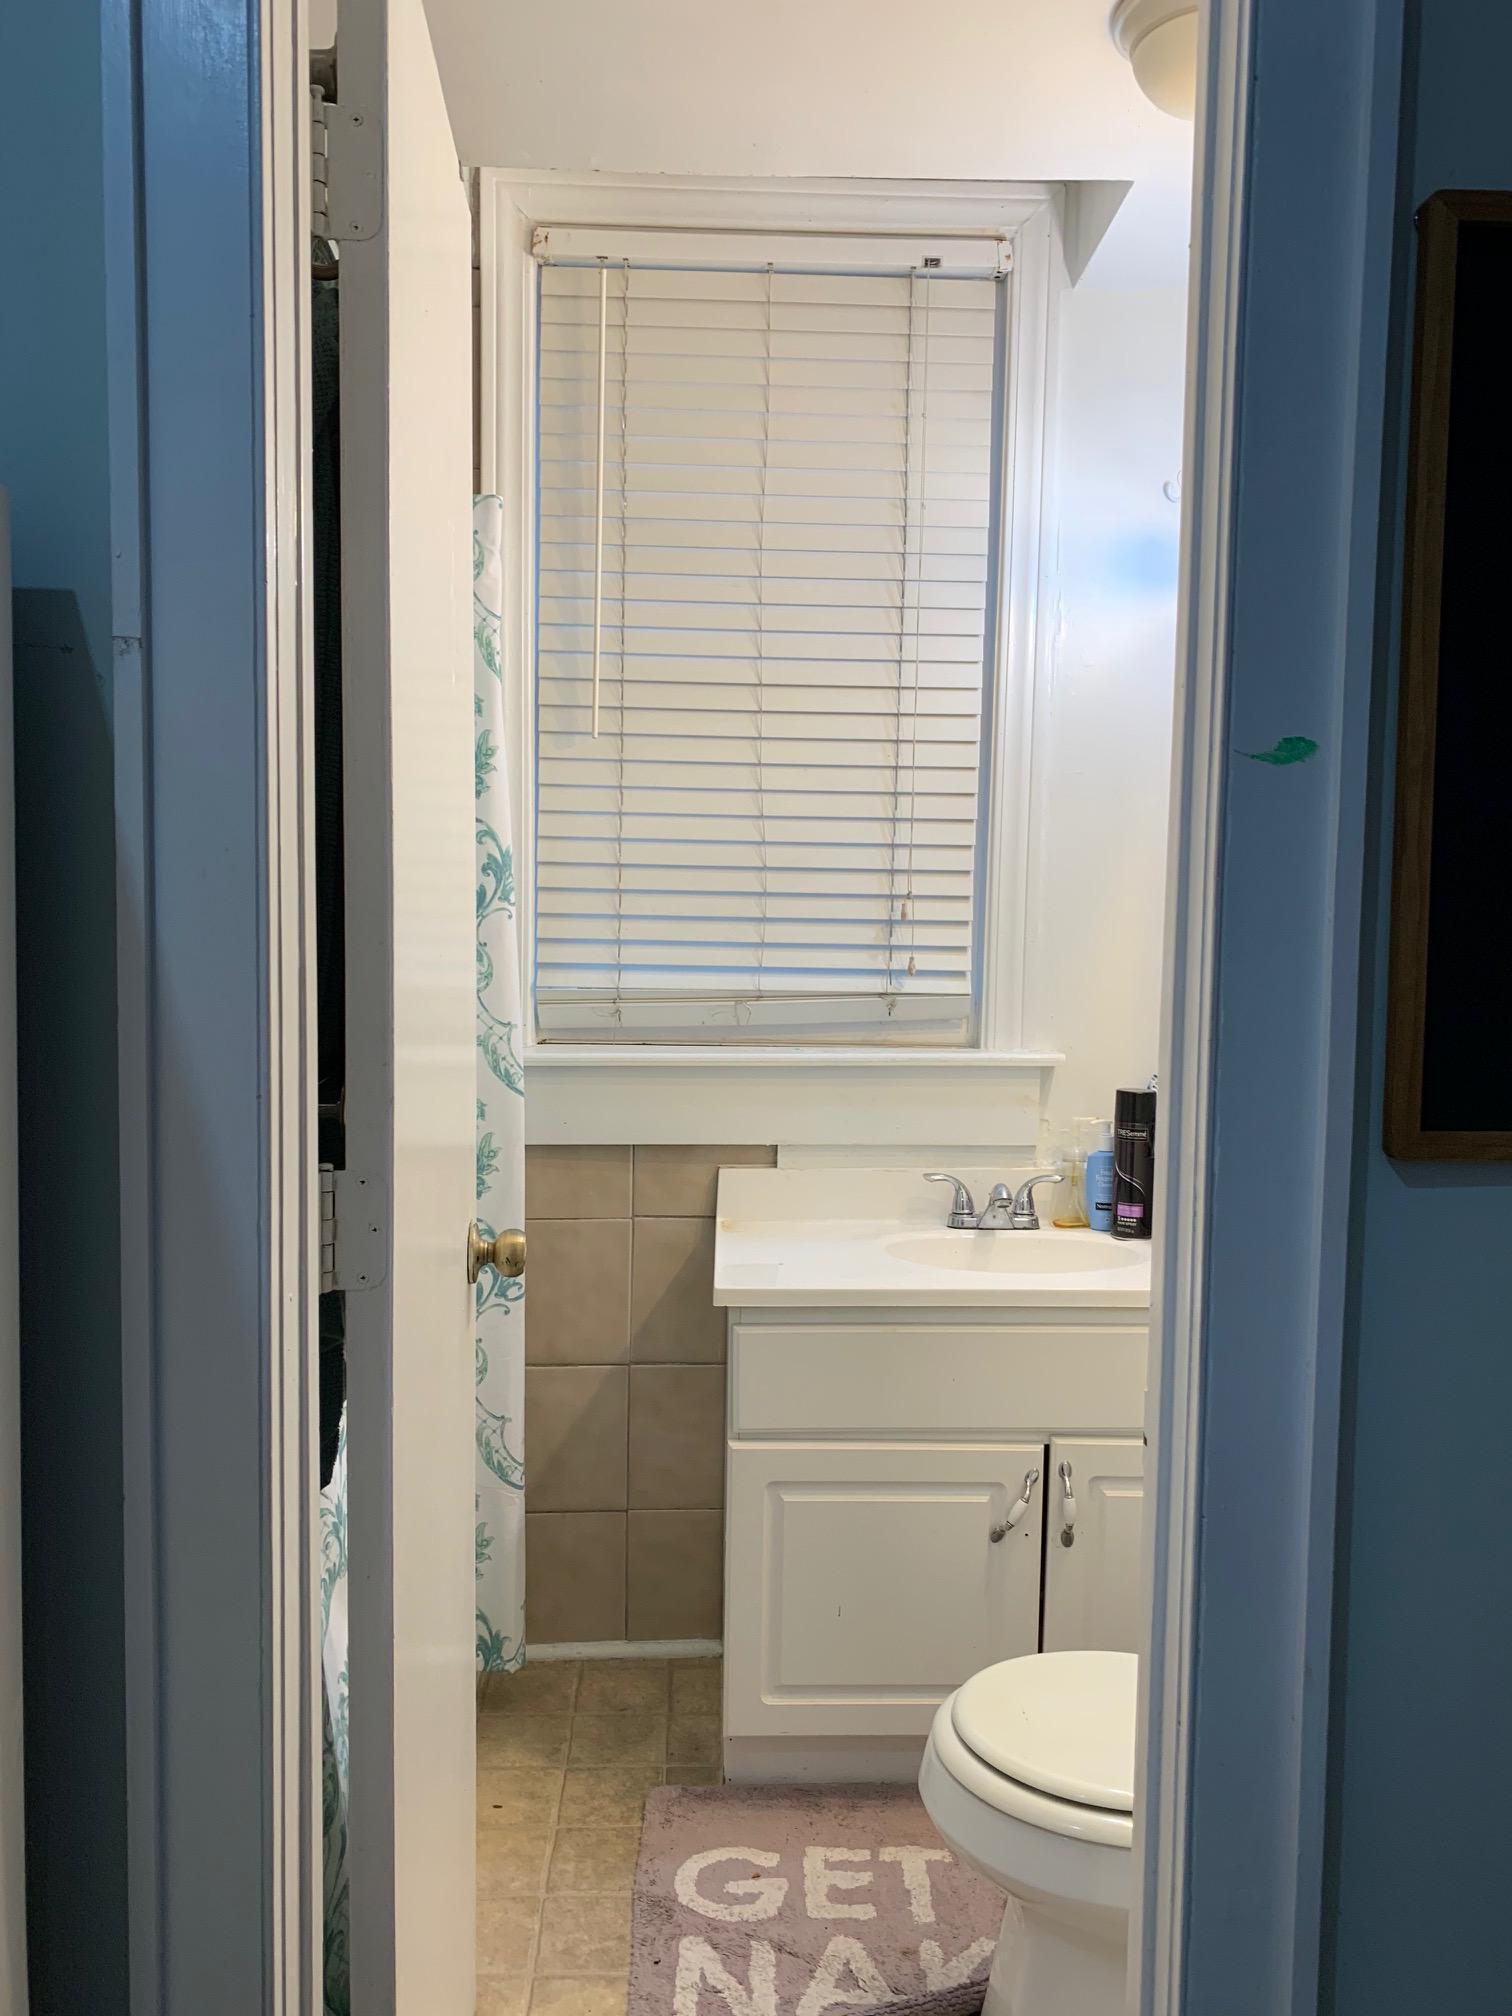 163.5 A Coming Street  bathroom